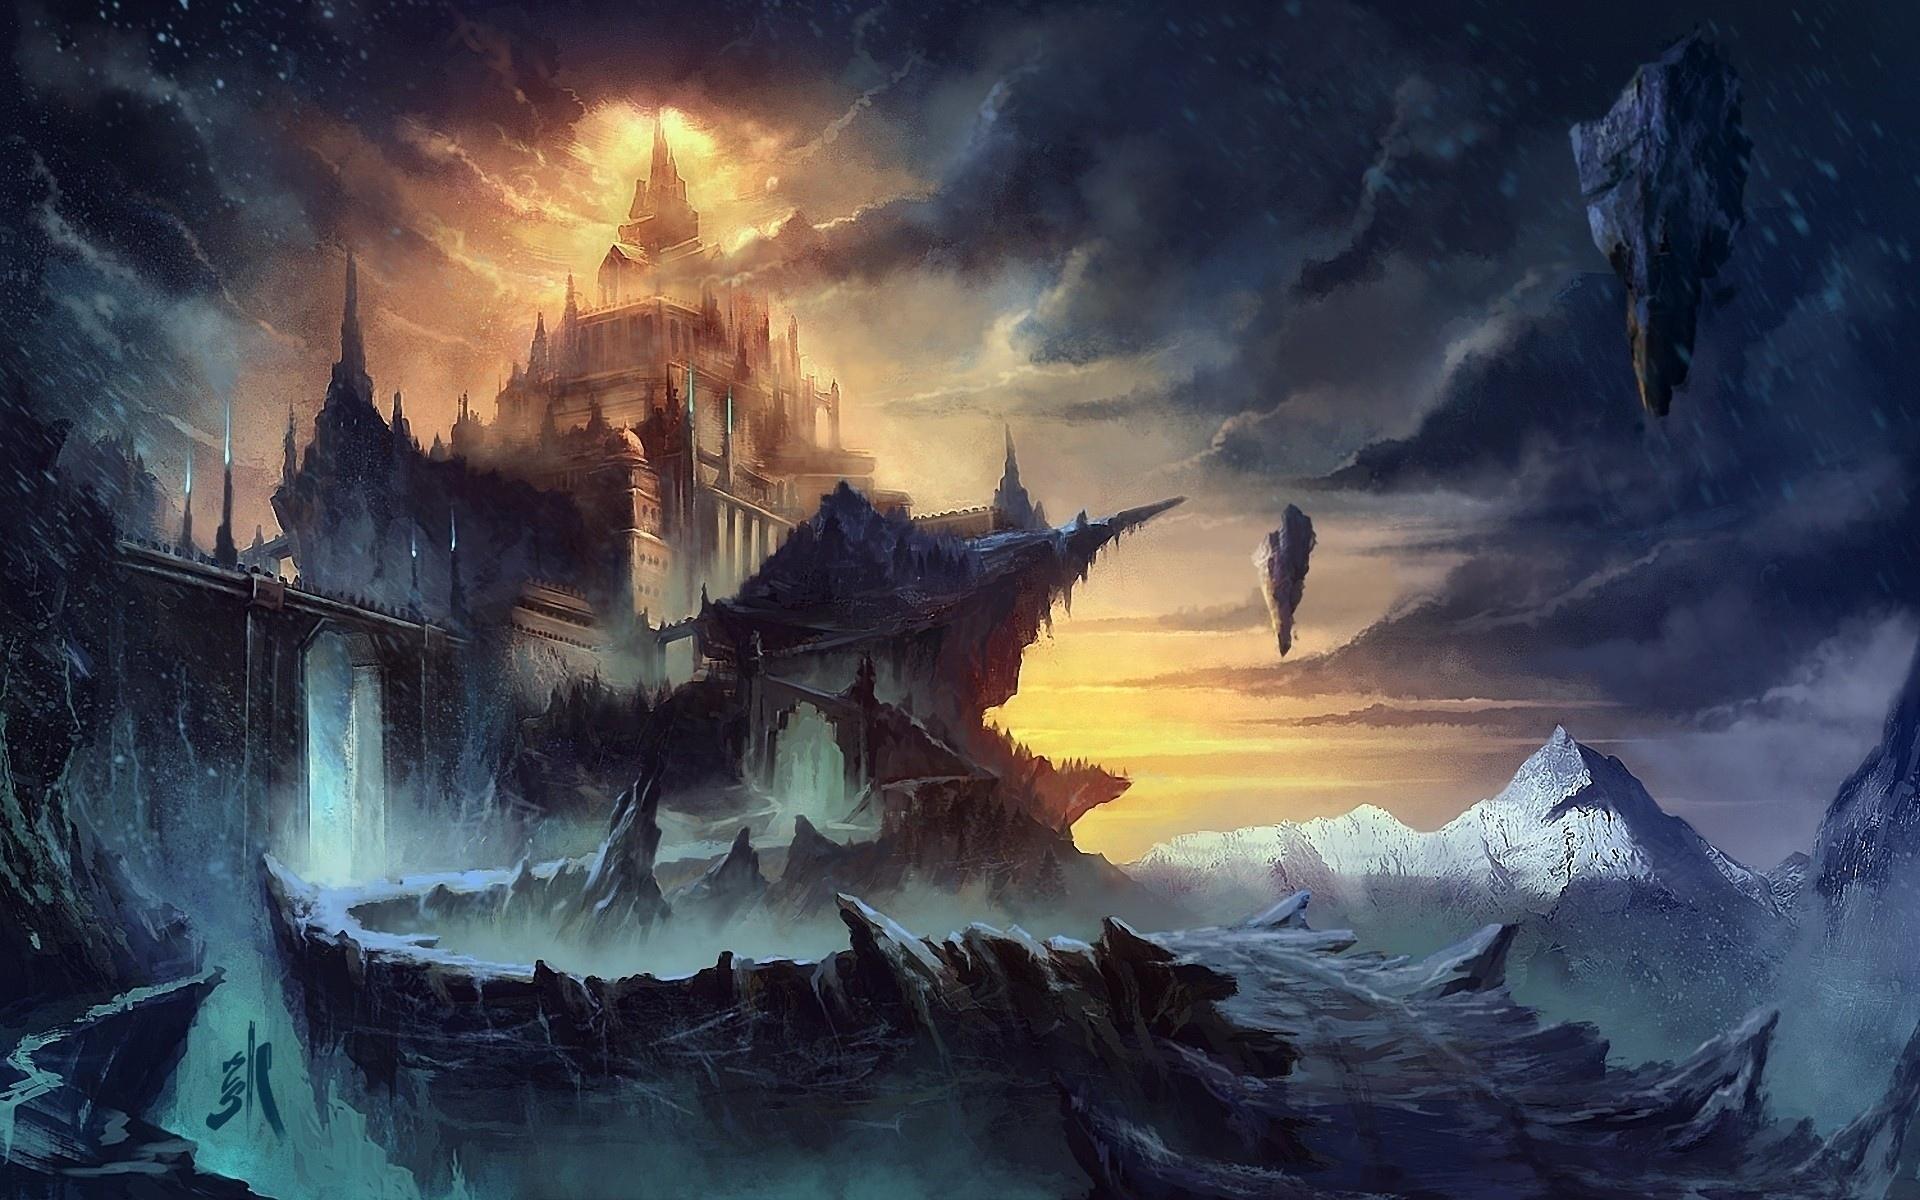 Sergey zabelin cghub com sergey zabelin zabelin fantasy cg for Architecture fantastique